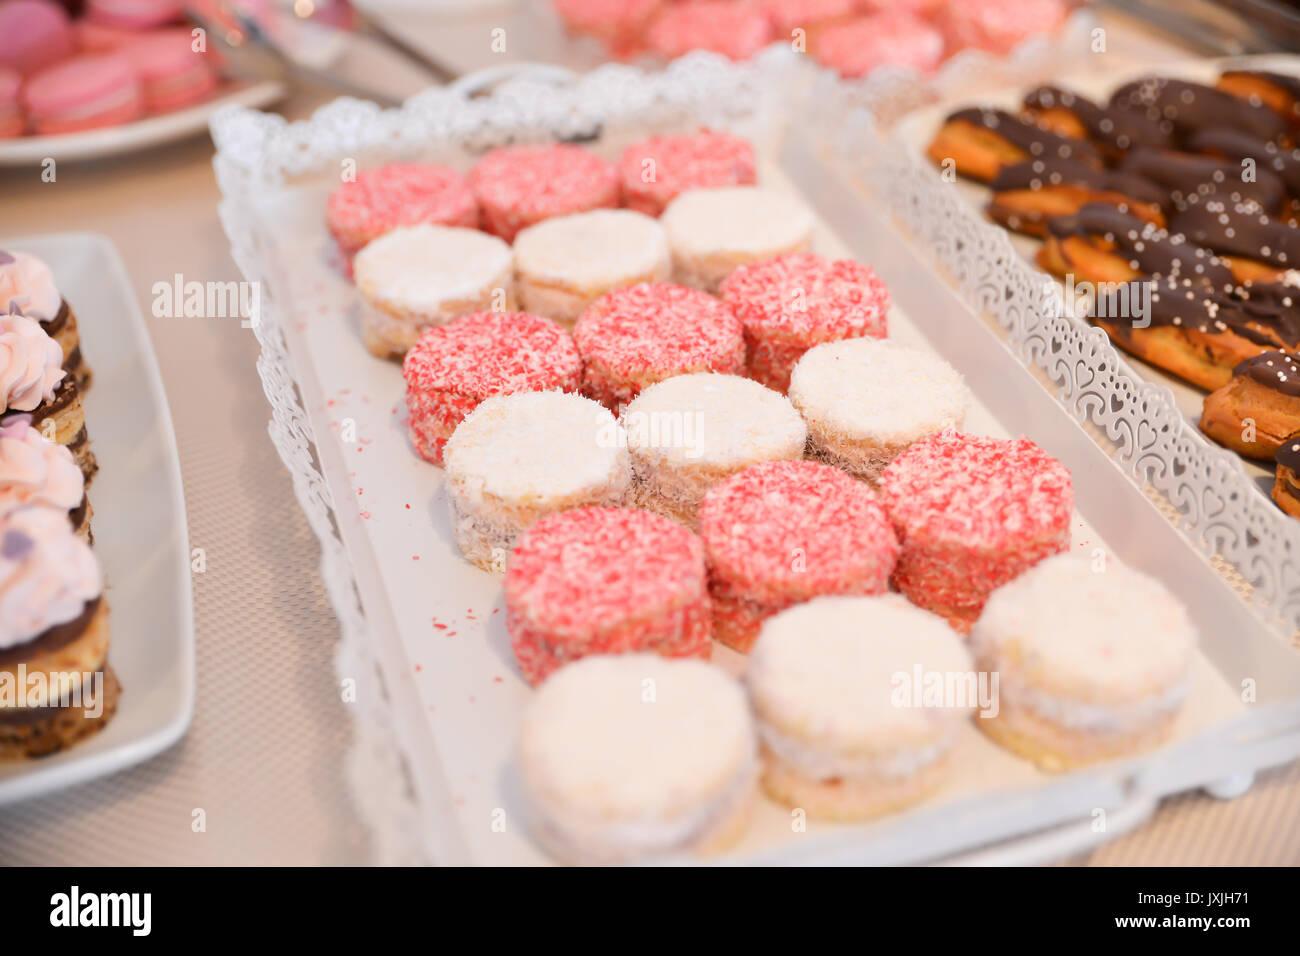 Wedding Cake Food Desert Stock Photos & Wedding Cake Food Desert ...